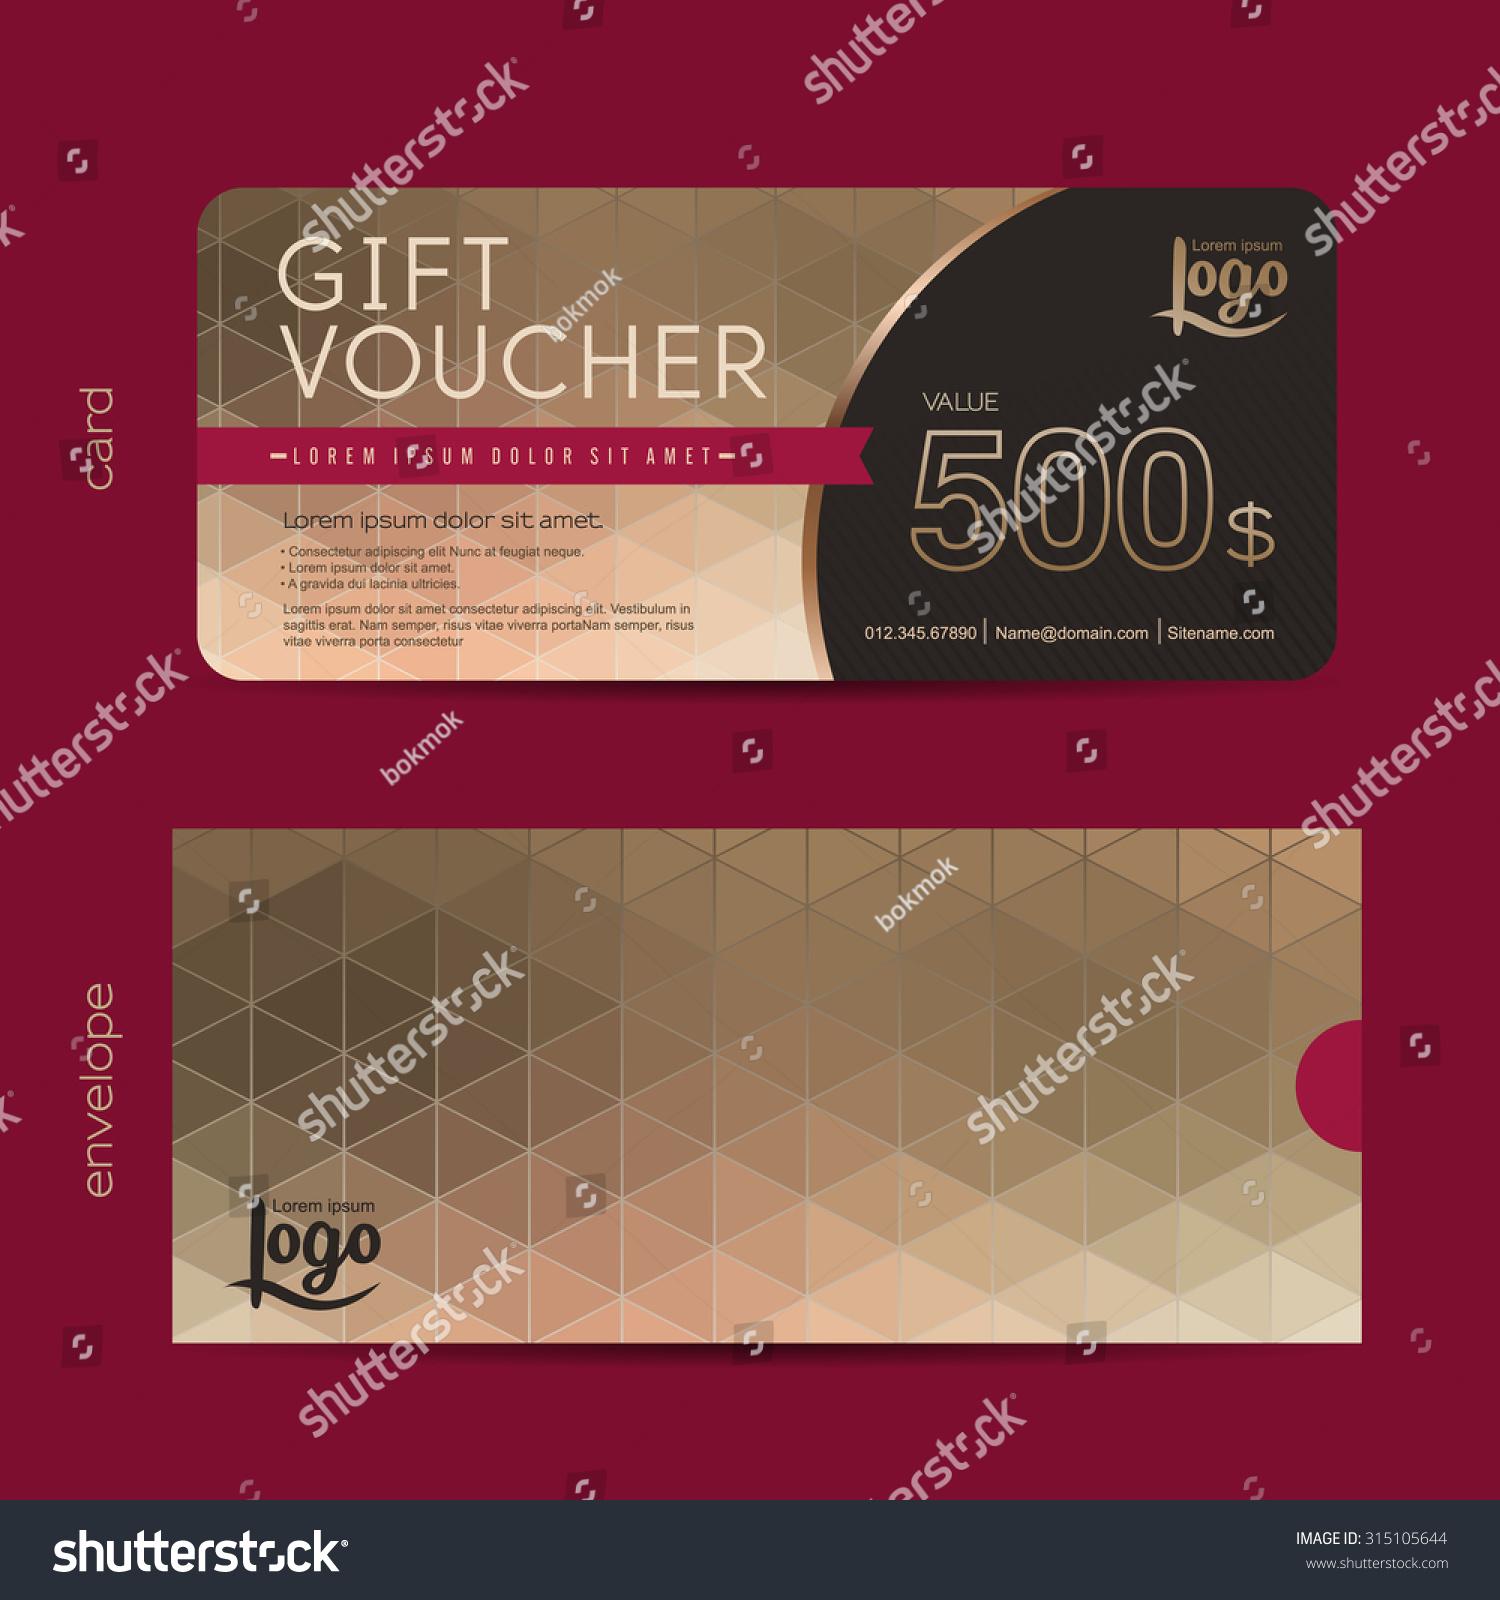 Gift Voucher Template Premium Patterngift Voucher Stock Vector